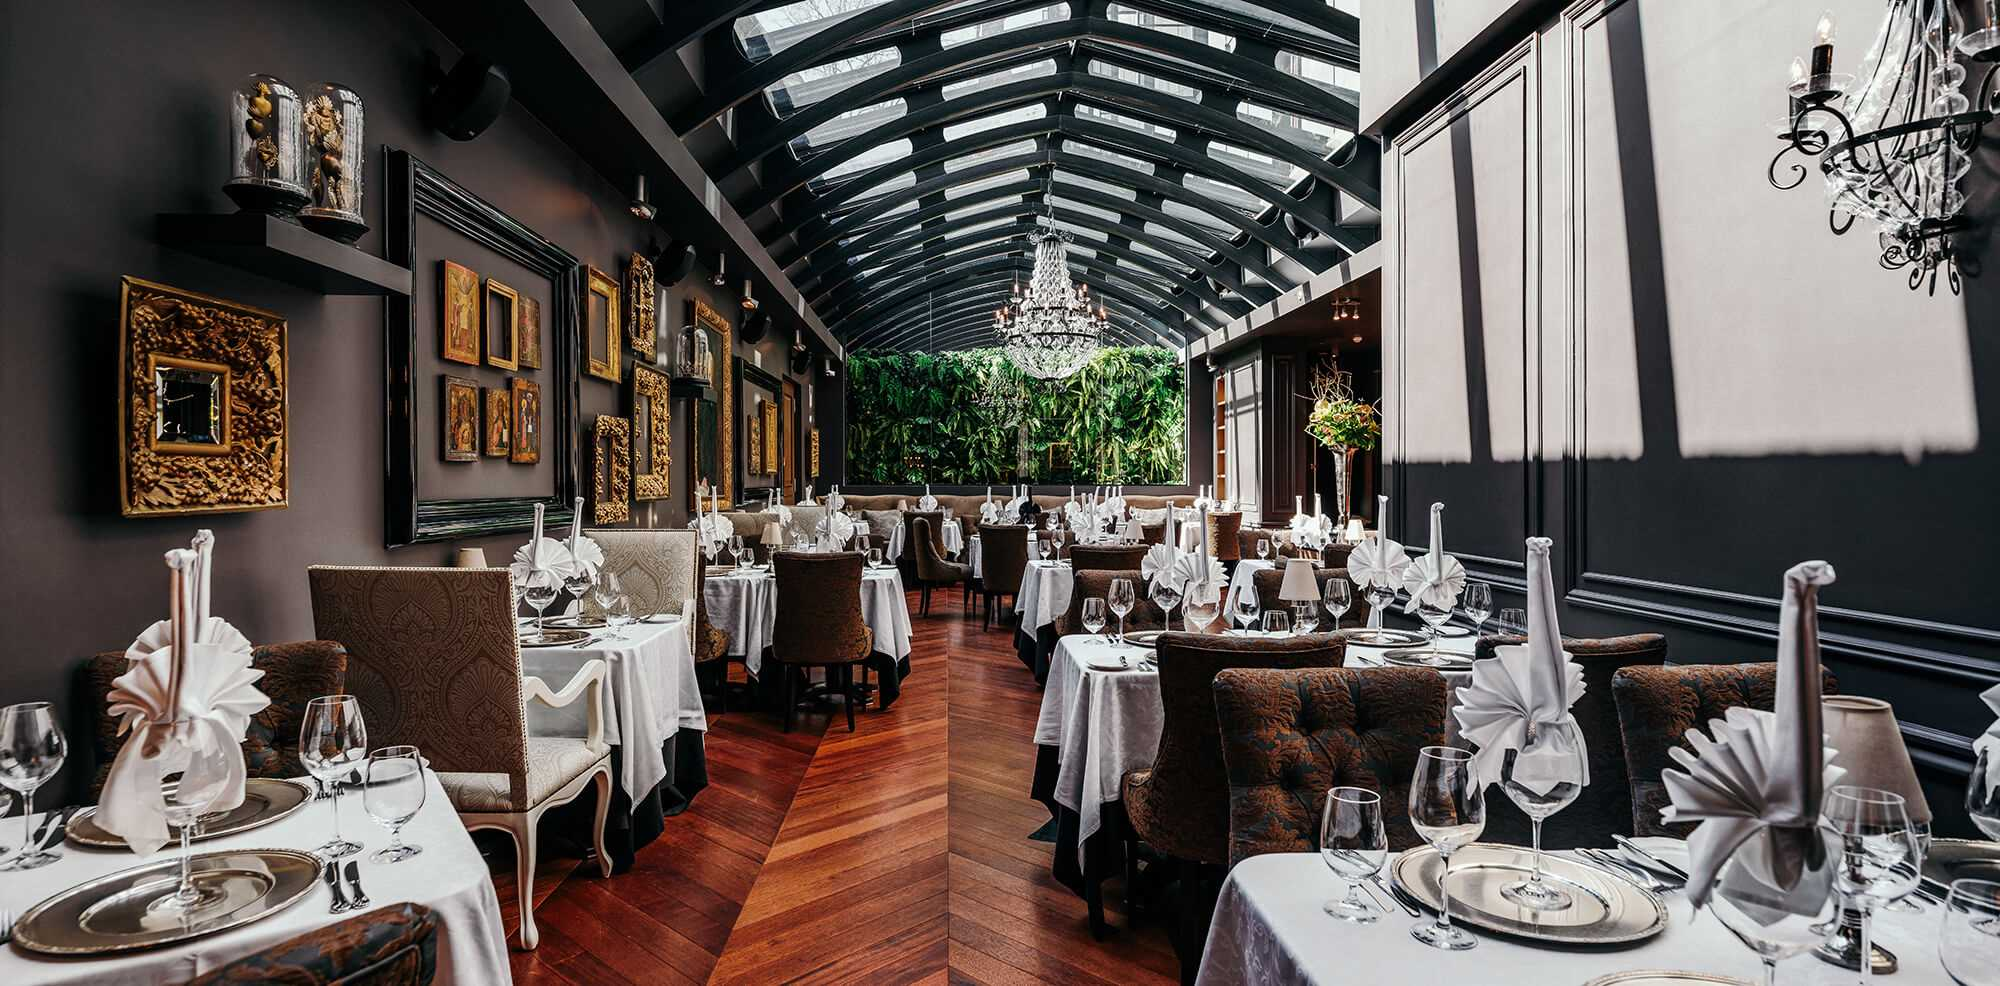 Hotel Telefgraaf Restaurant